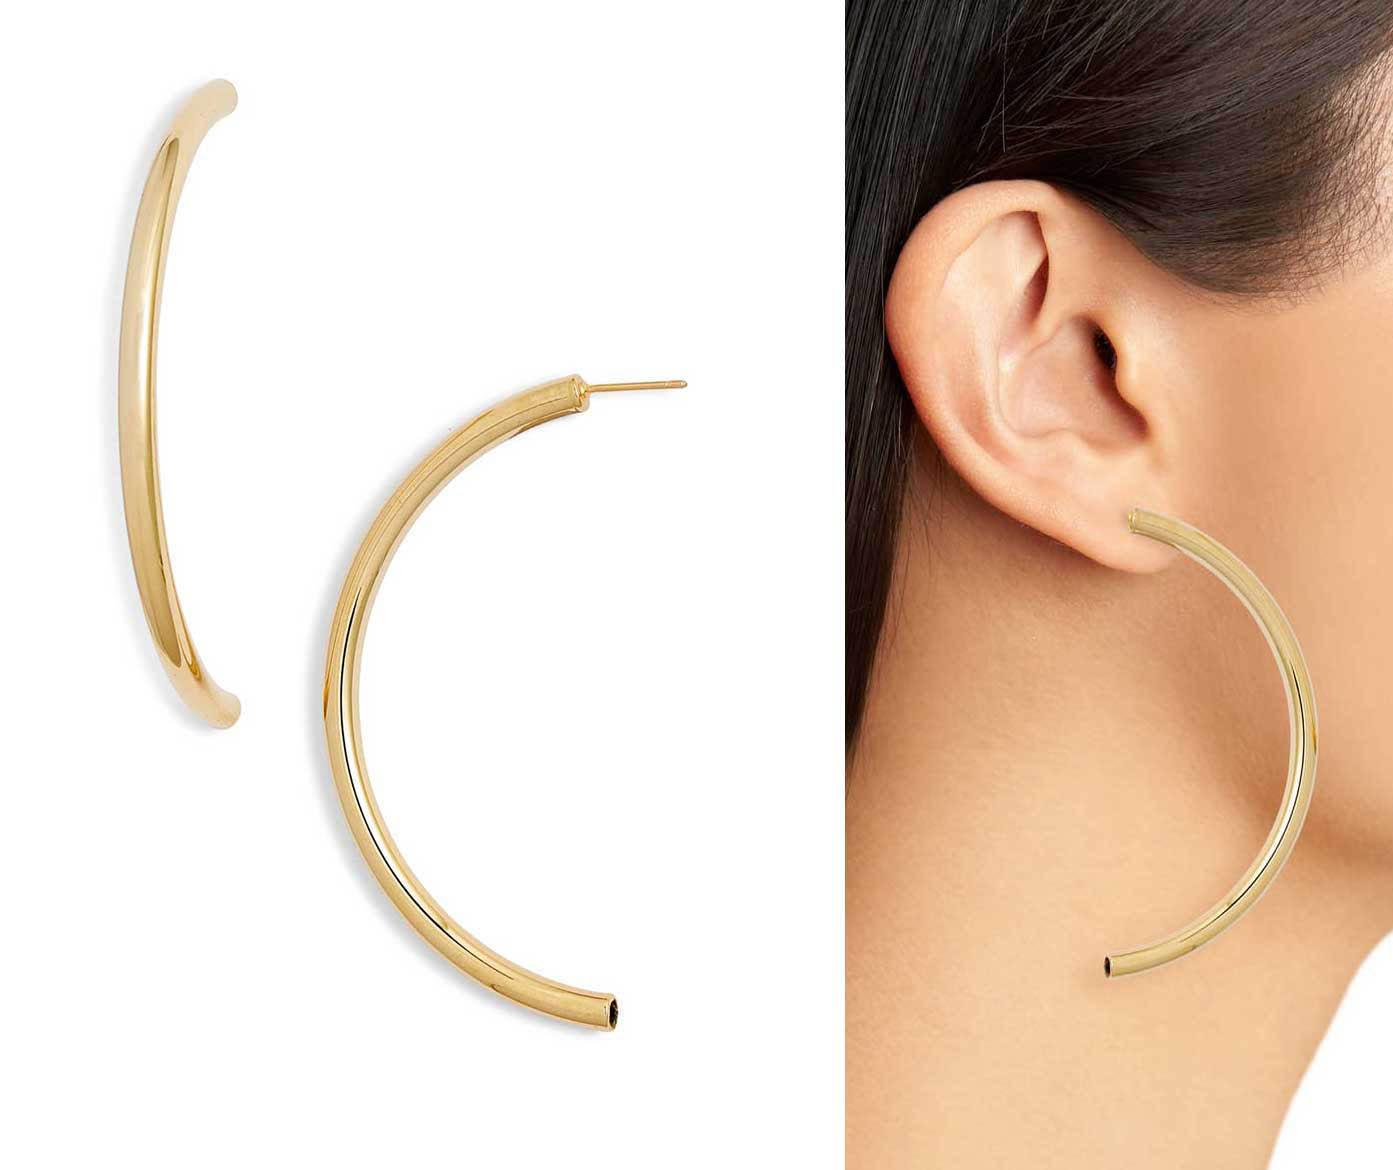 Venice Half Hoop Earrings by Bracha, Runway Jewelry Trends 2019